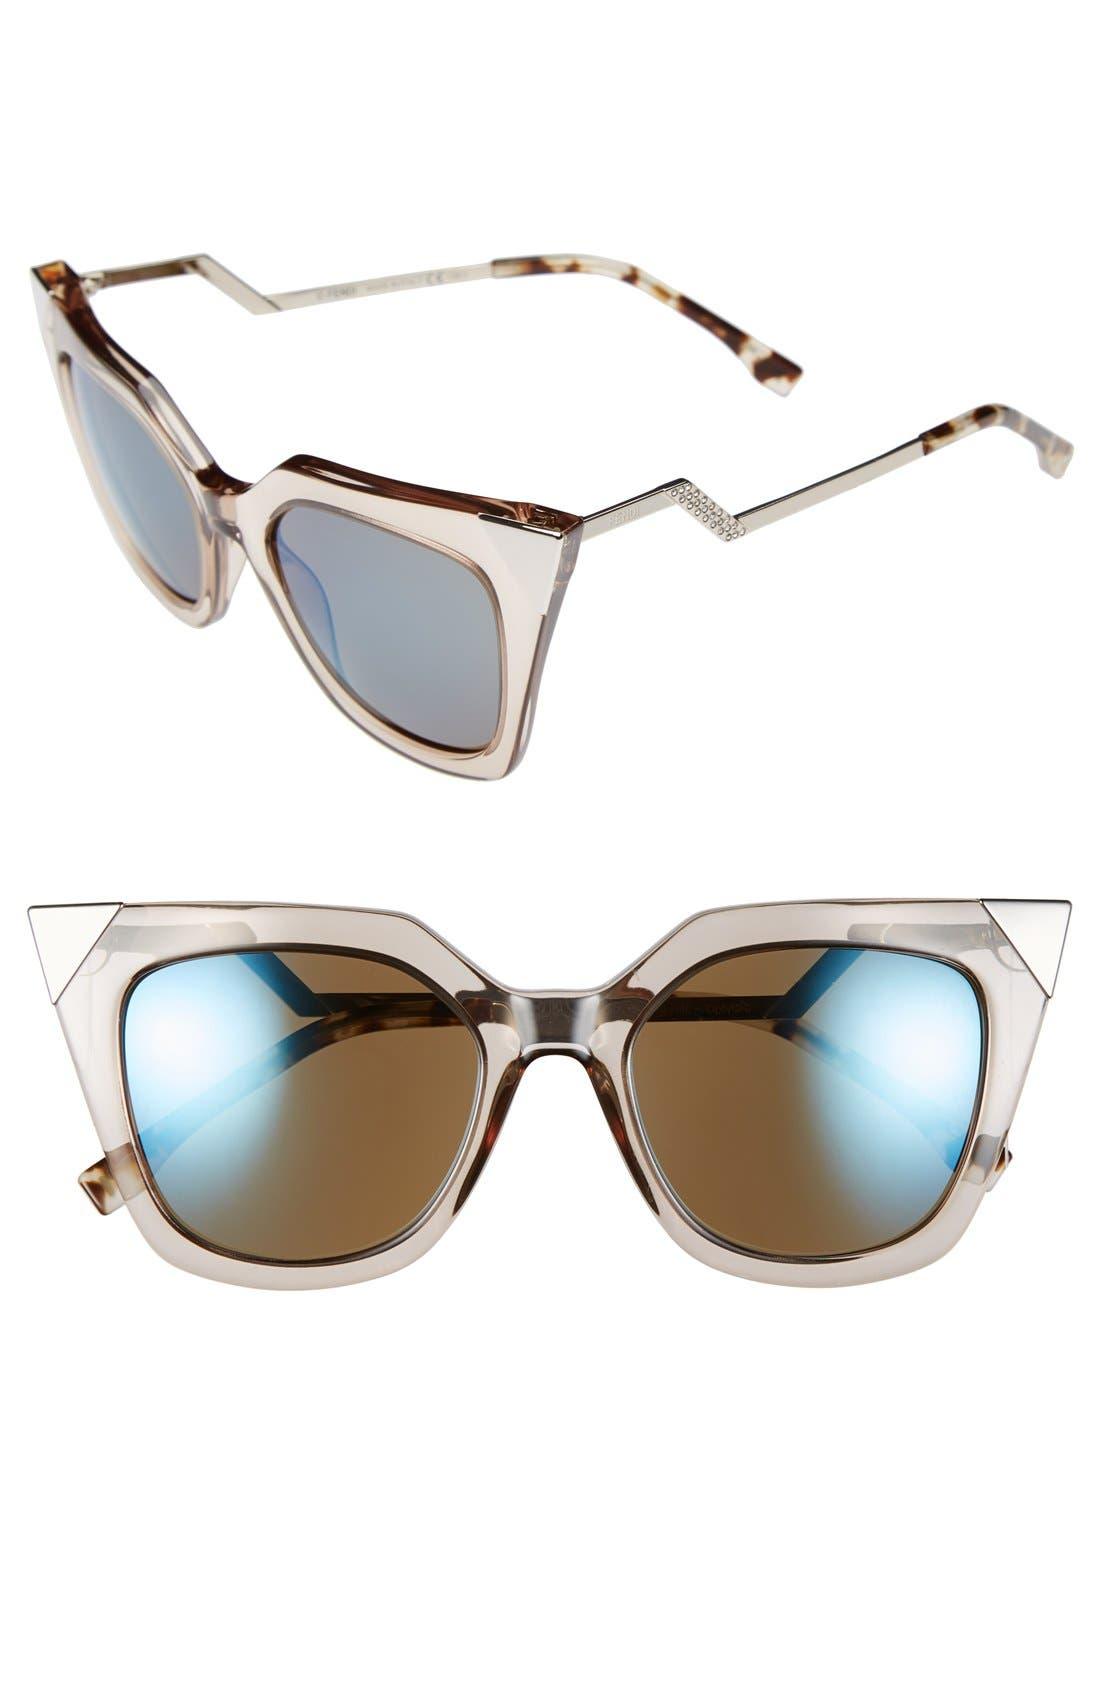 52mm Cat Eye Sunglasses,                             Main thumbnail 3, color,